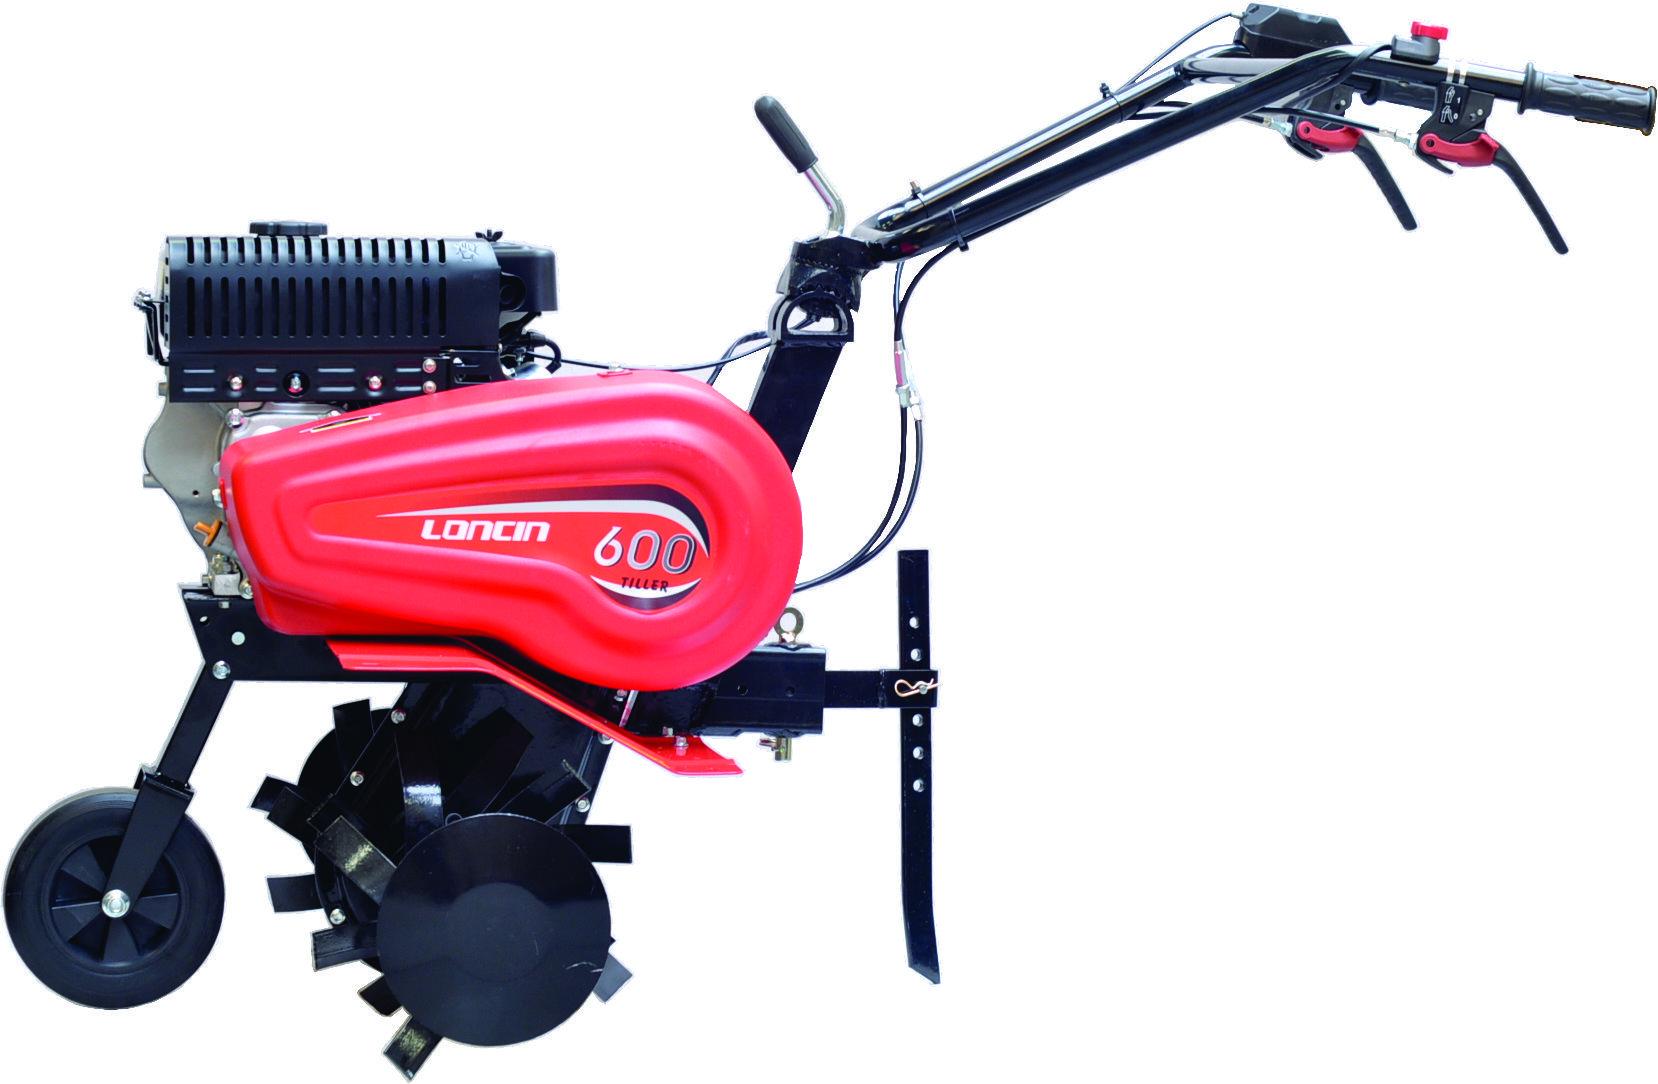 LCT600